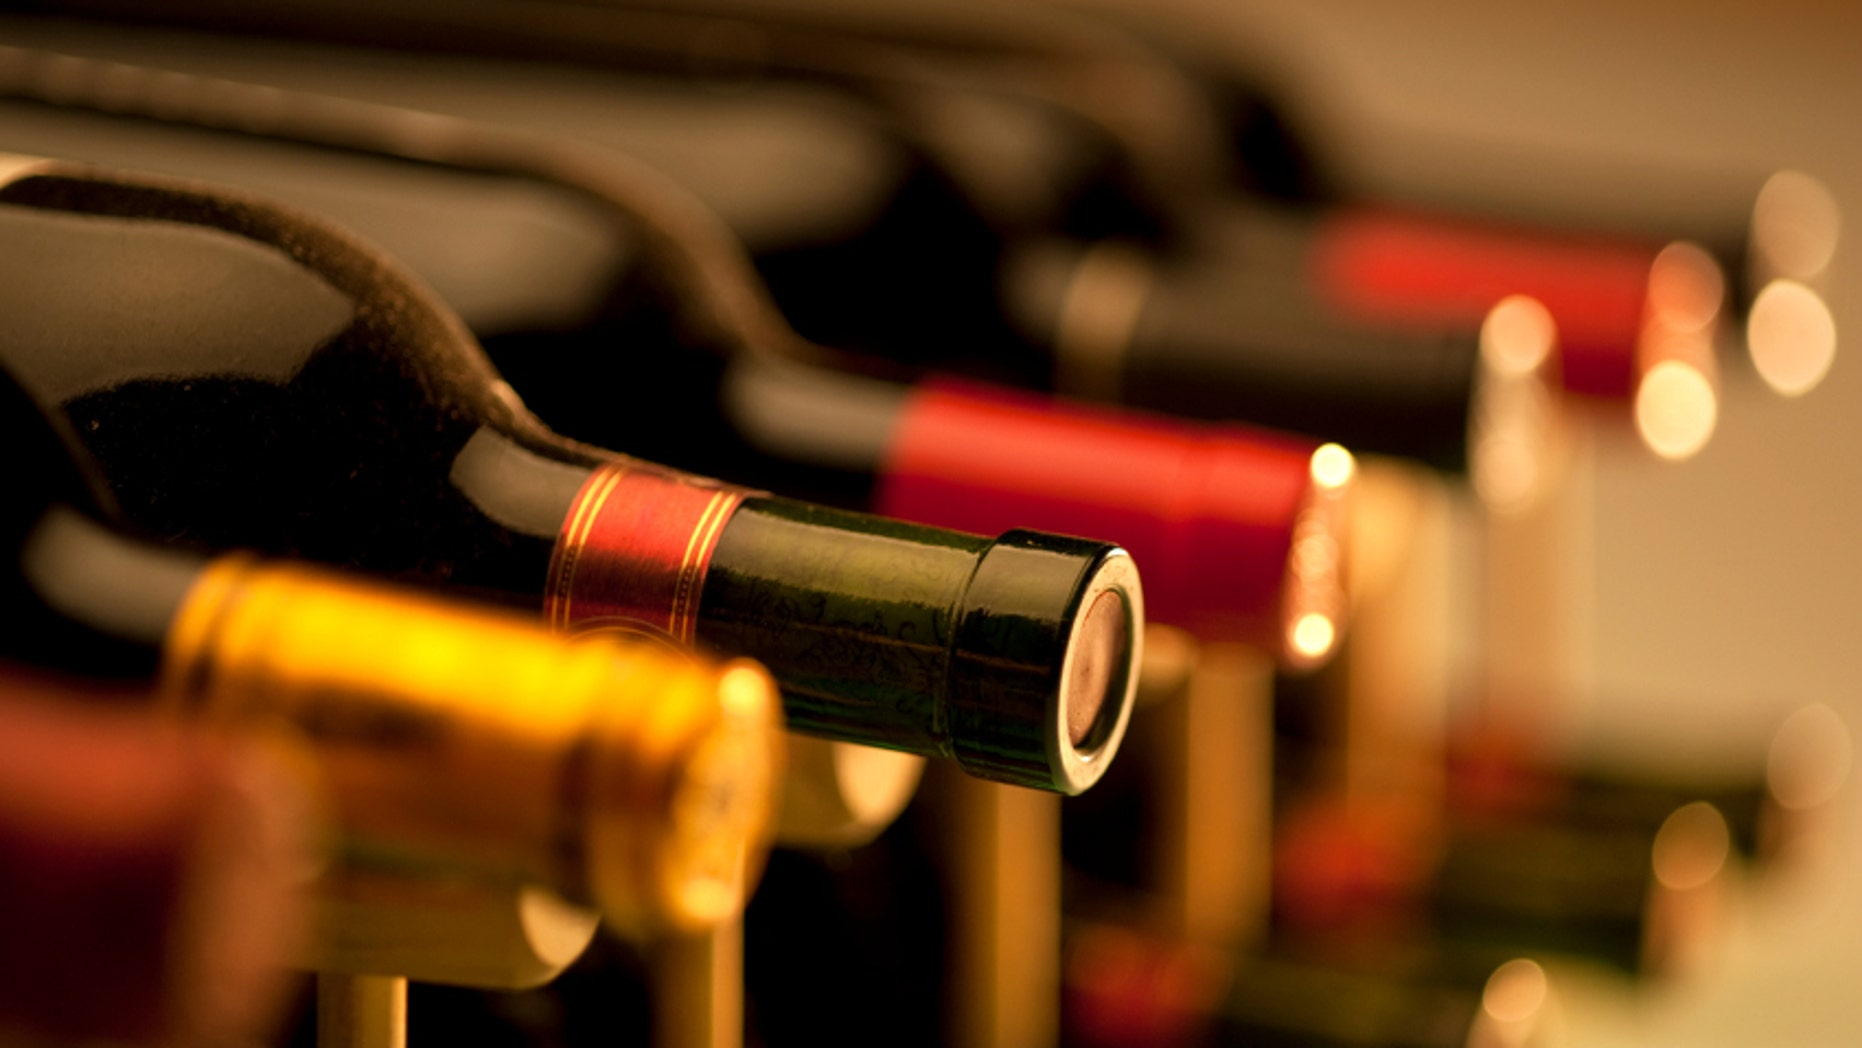 Henri Jayer Richebourg Grand Cru, Cote de Nuits, France commands between $15,000 to $20,000 a bottle.